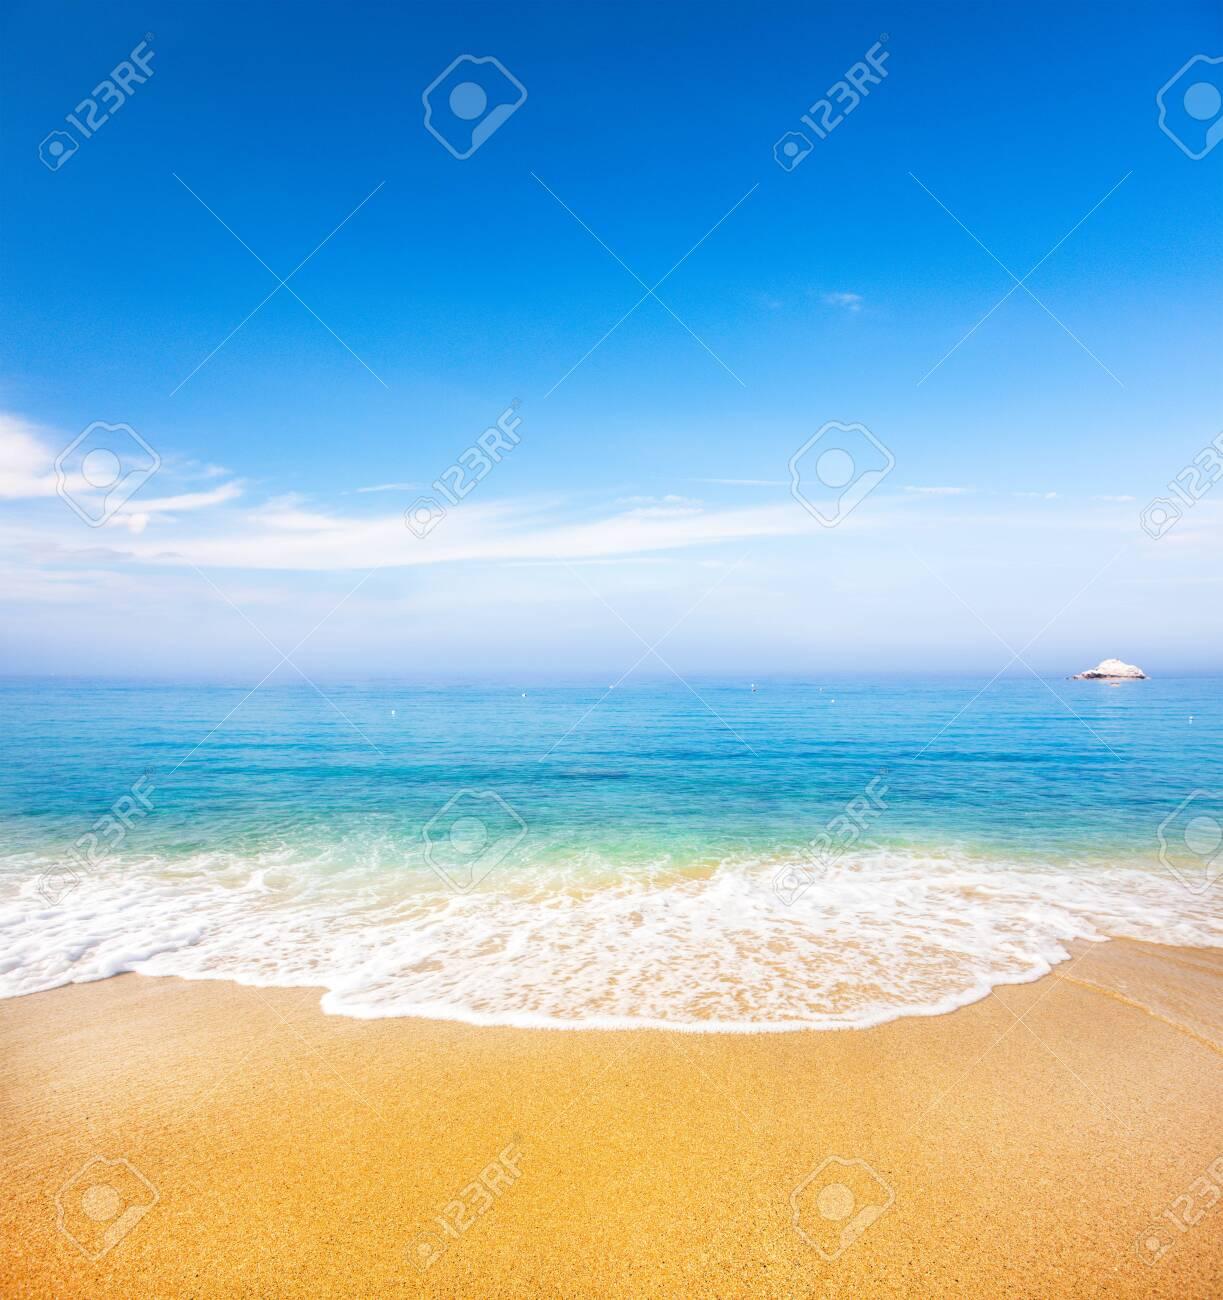 beautiful tropical beach and sea - 141290495